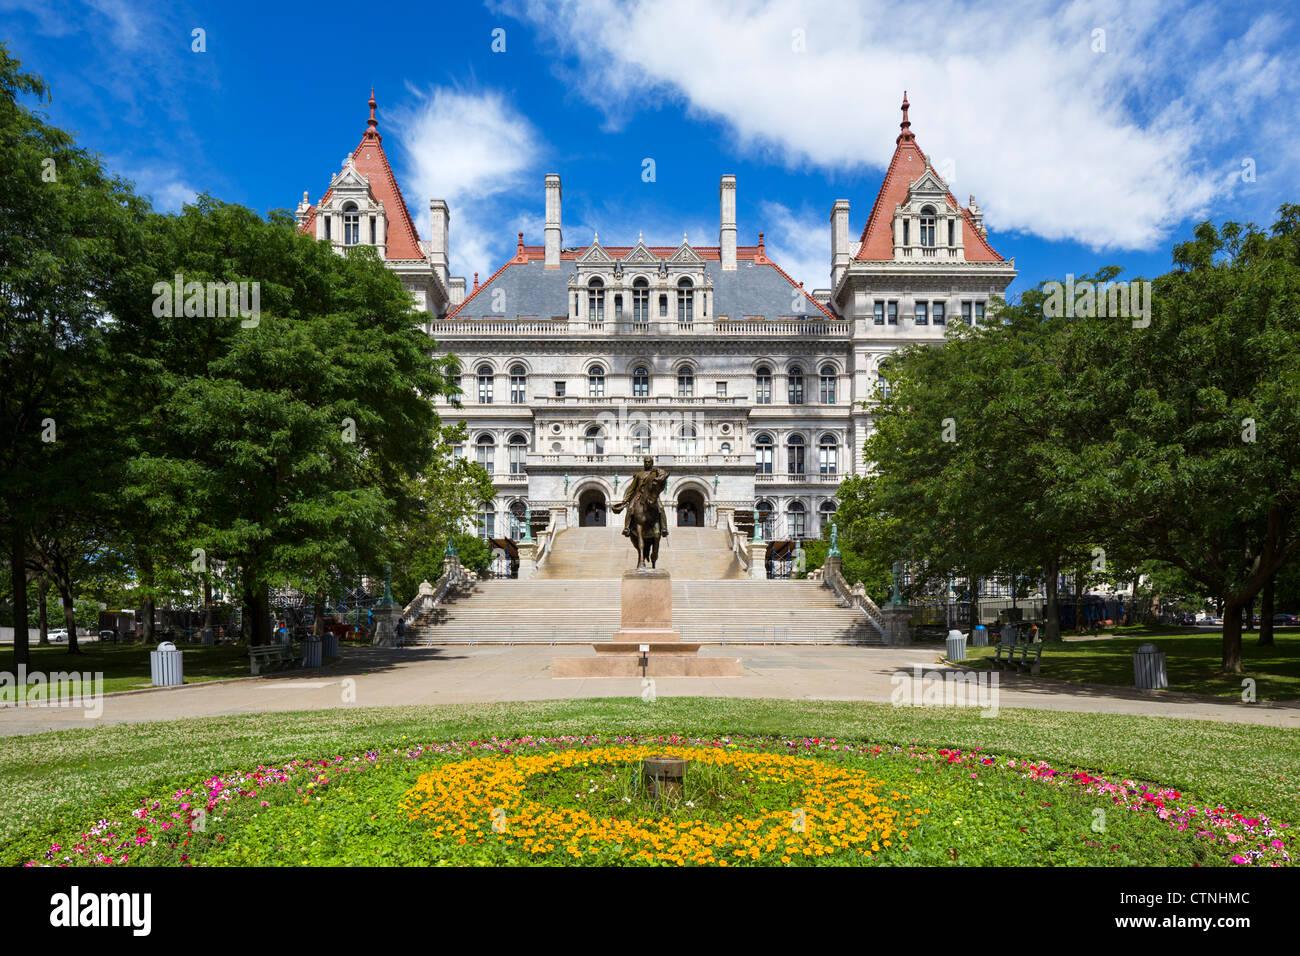 New York State Capitol, Albany, New York State, USA Stockbild